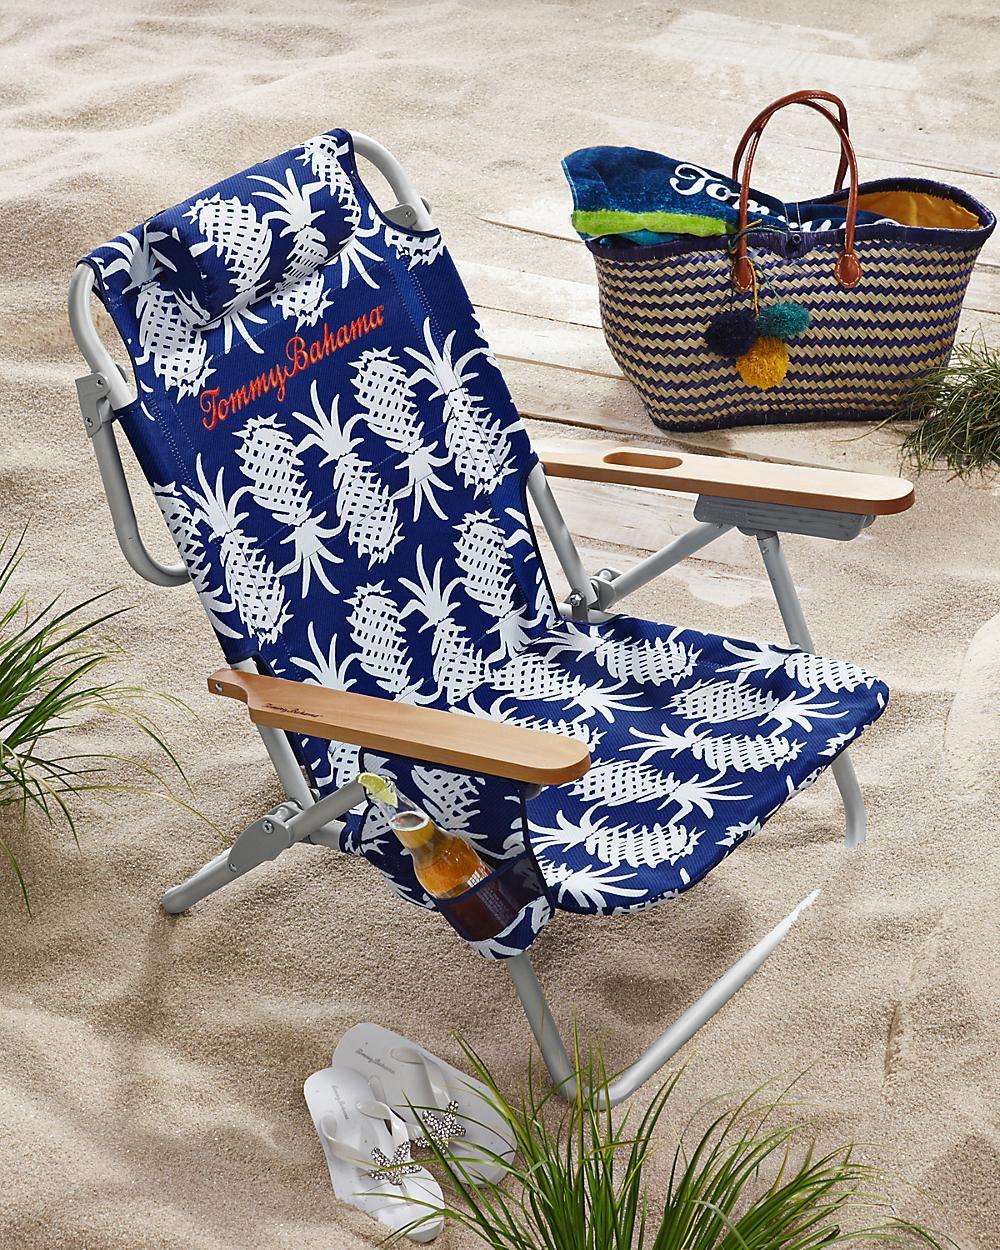 Tommy Bahama Official Site Backpack Beach Chair Beach Chairs Beach Gear